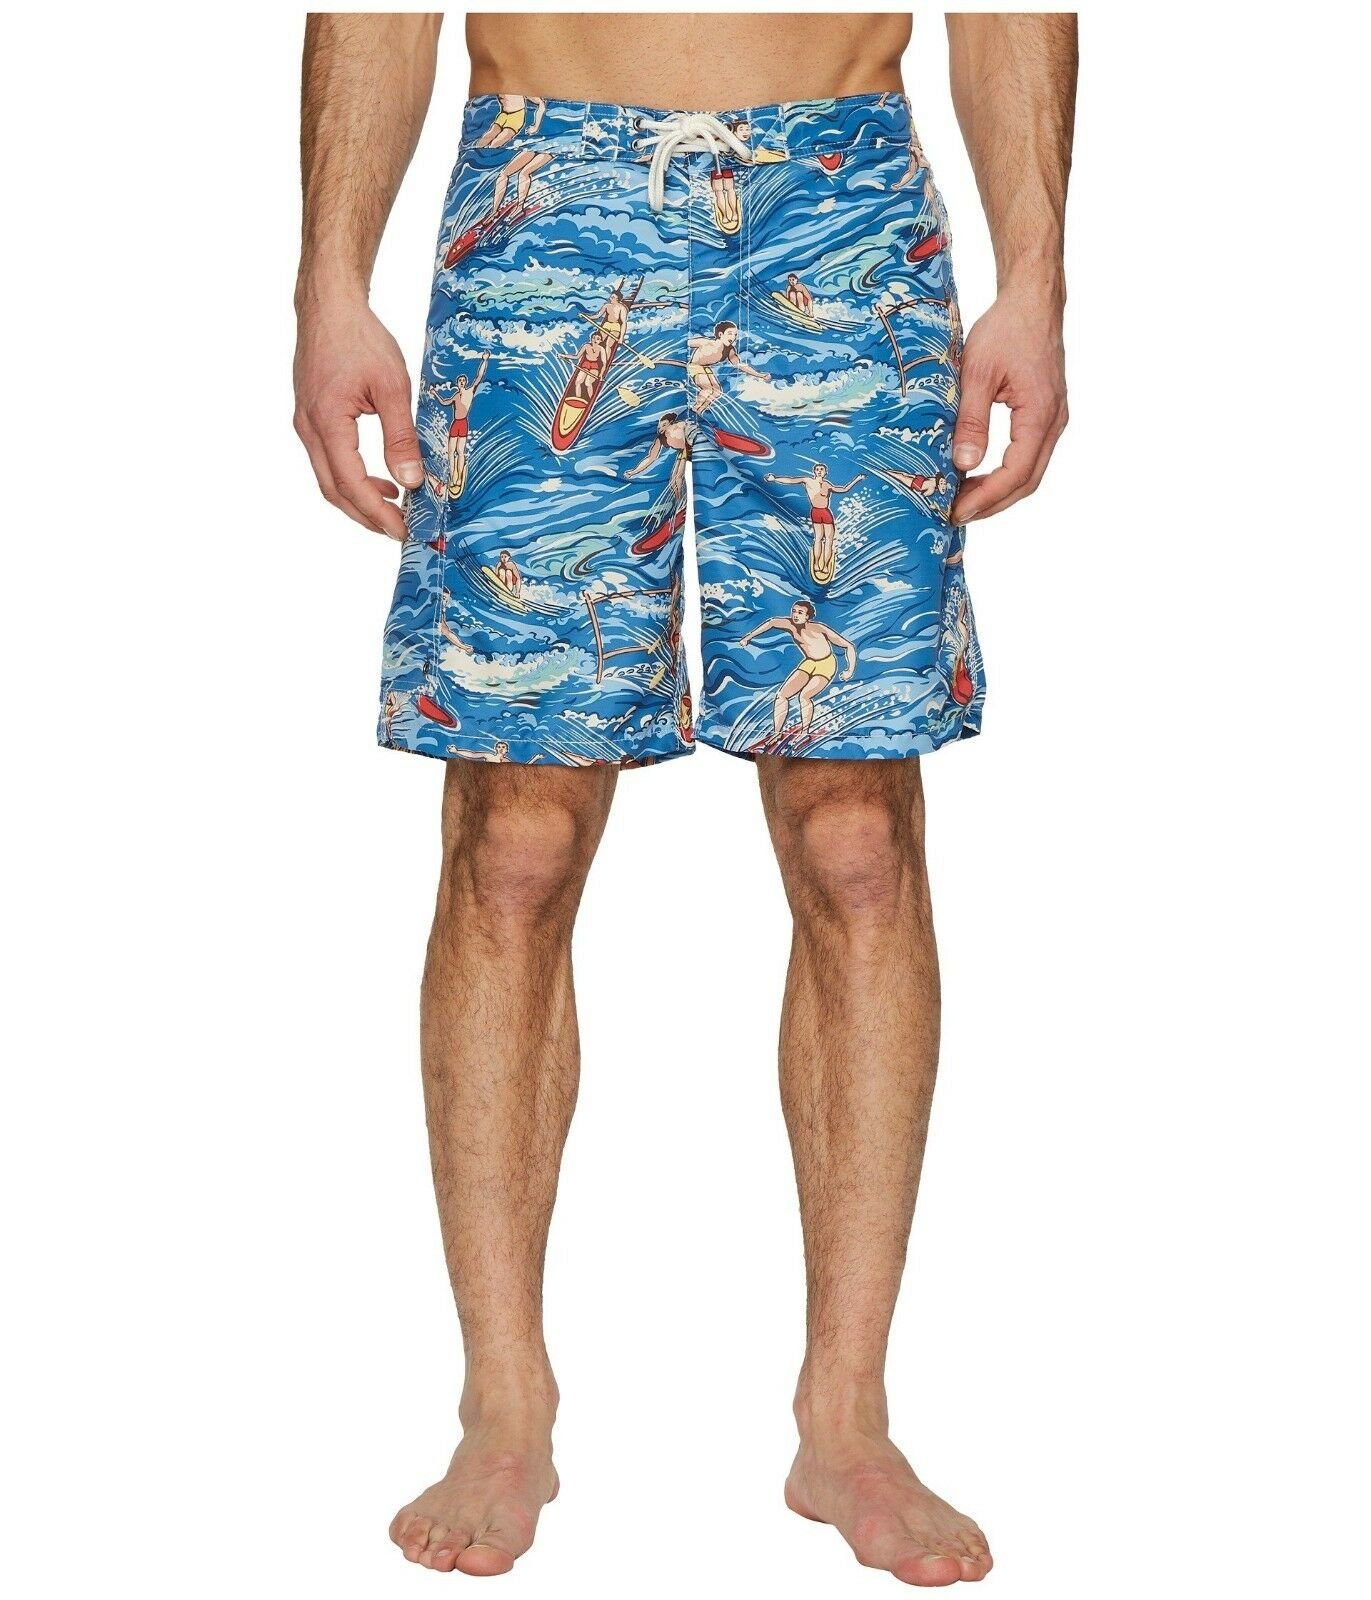 Polo Ralph Lauren Men's Big & Tall Kailua Swim Trunks,Hawaiian, 2XLT , MSRP 95